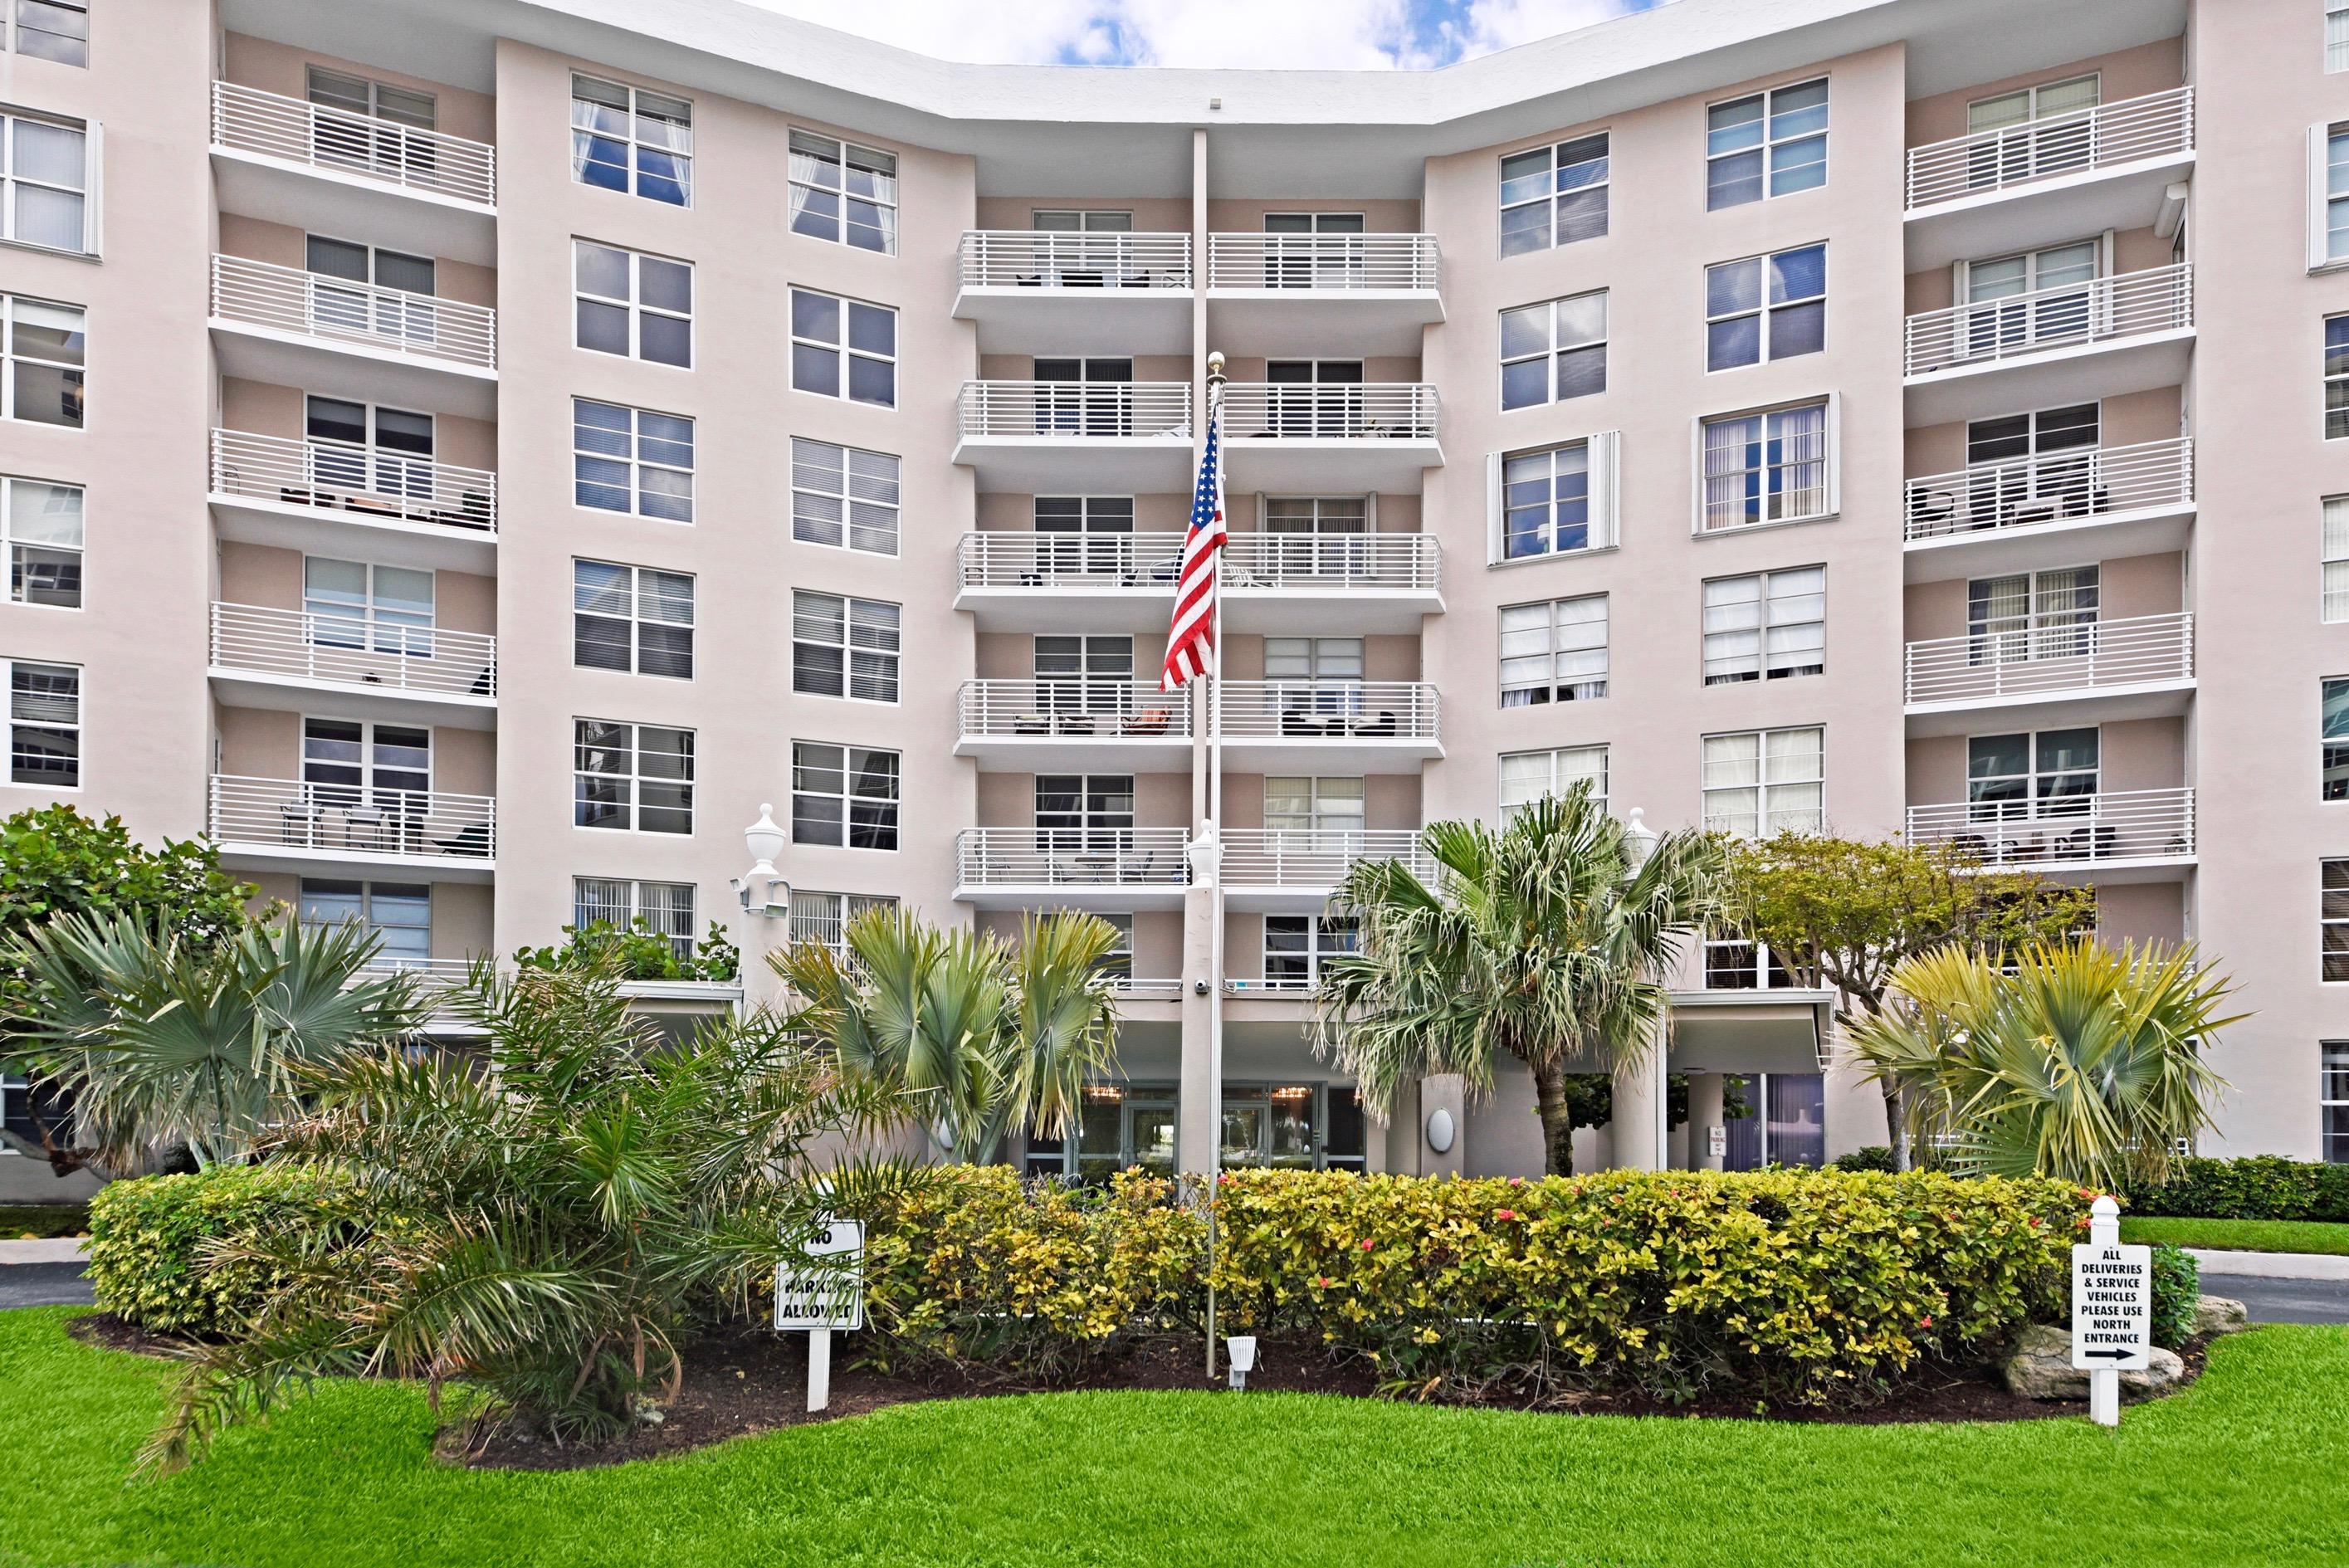 2851 Ocean Boulevard, Boca Raton, Florida 33432, 2 Bedrooms Bedrooms, ,2 BathroomsBathrooms,Rental,For Rent,Ocean,RX-10657889